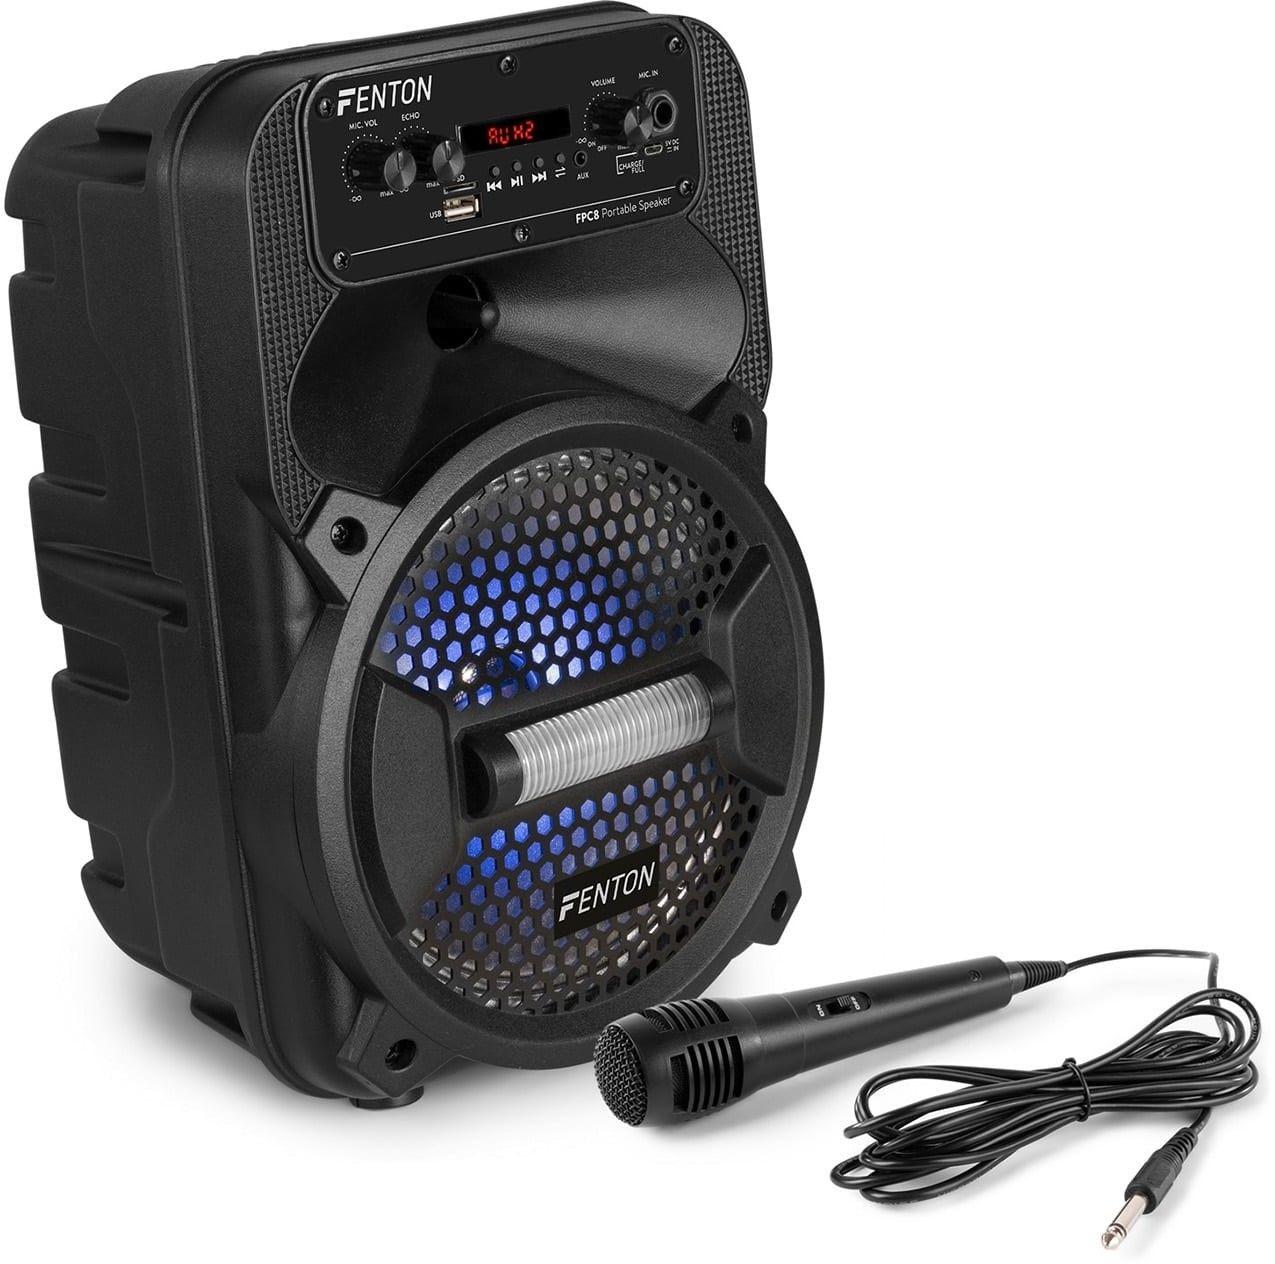 Fenton FPC8, kolumimprezowa, Bluetooth, USB/SD/AUX, LED, pilot zdalnego sterowania